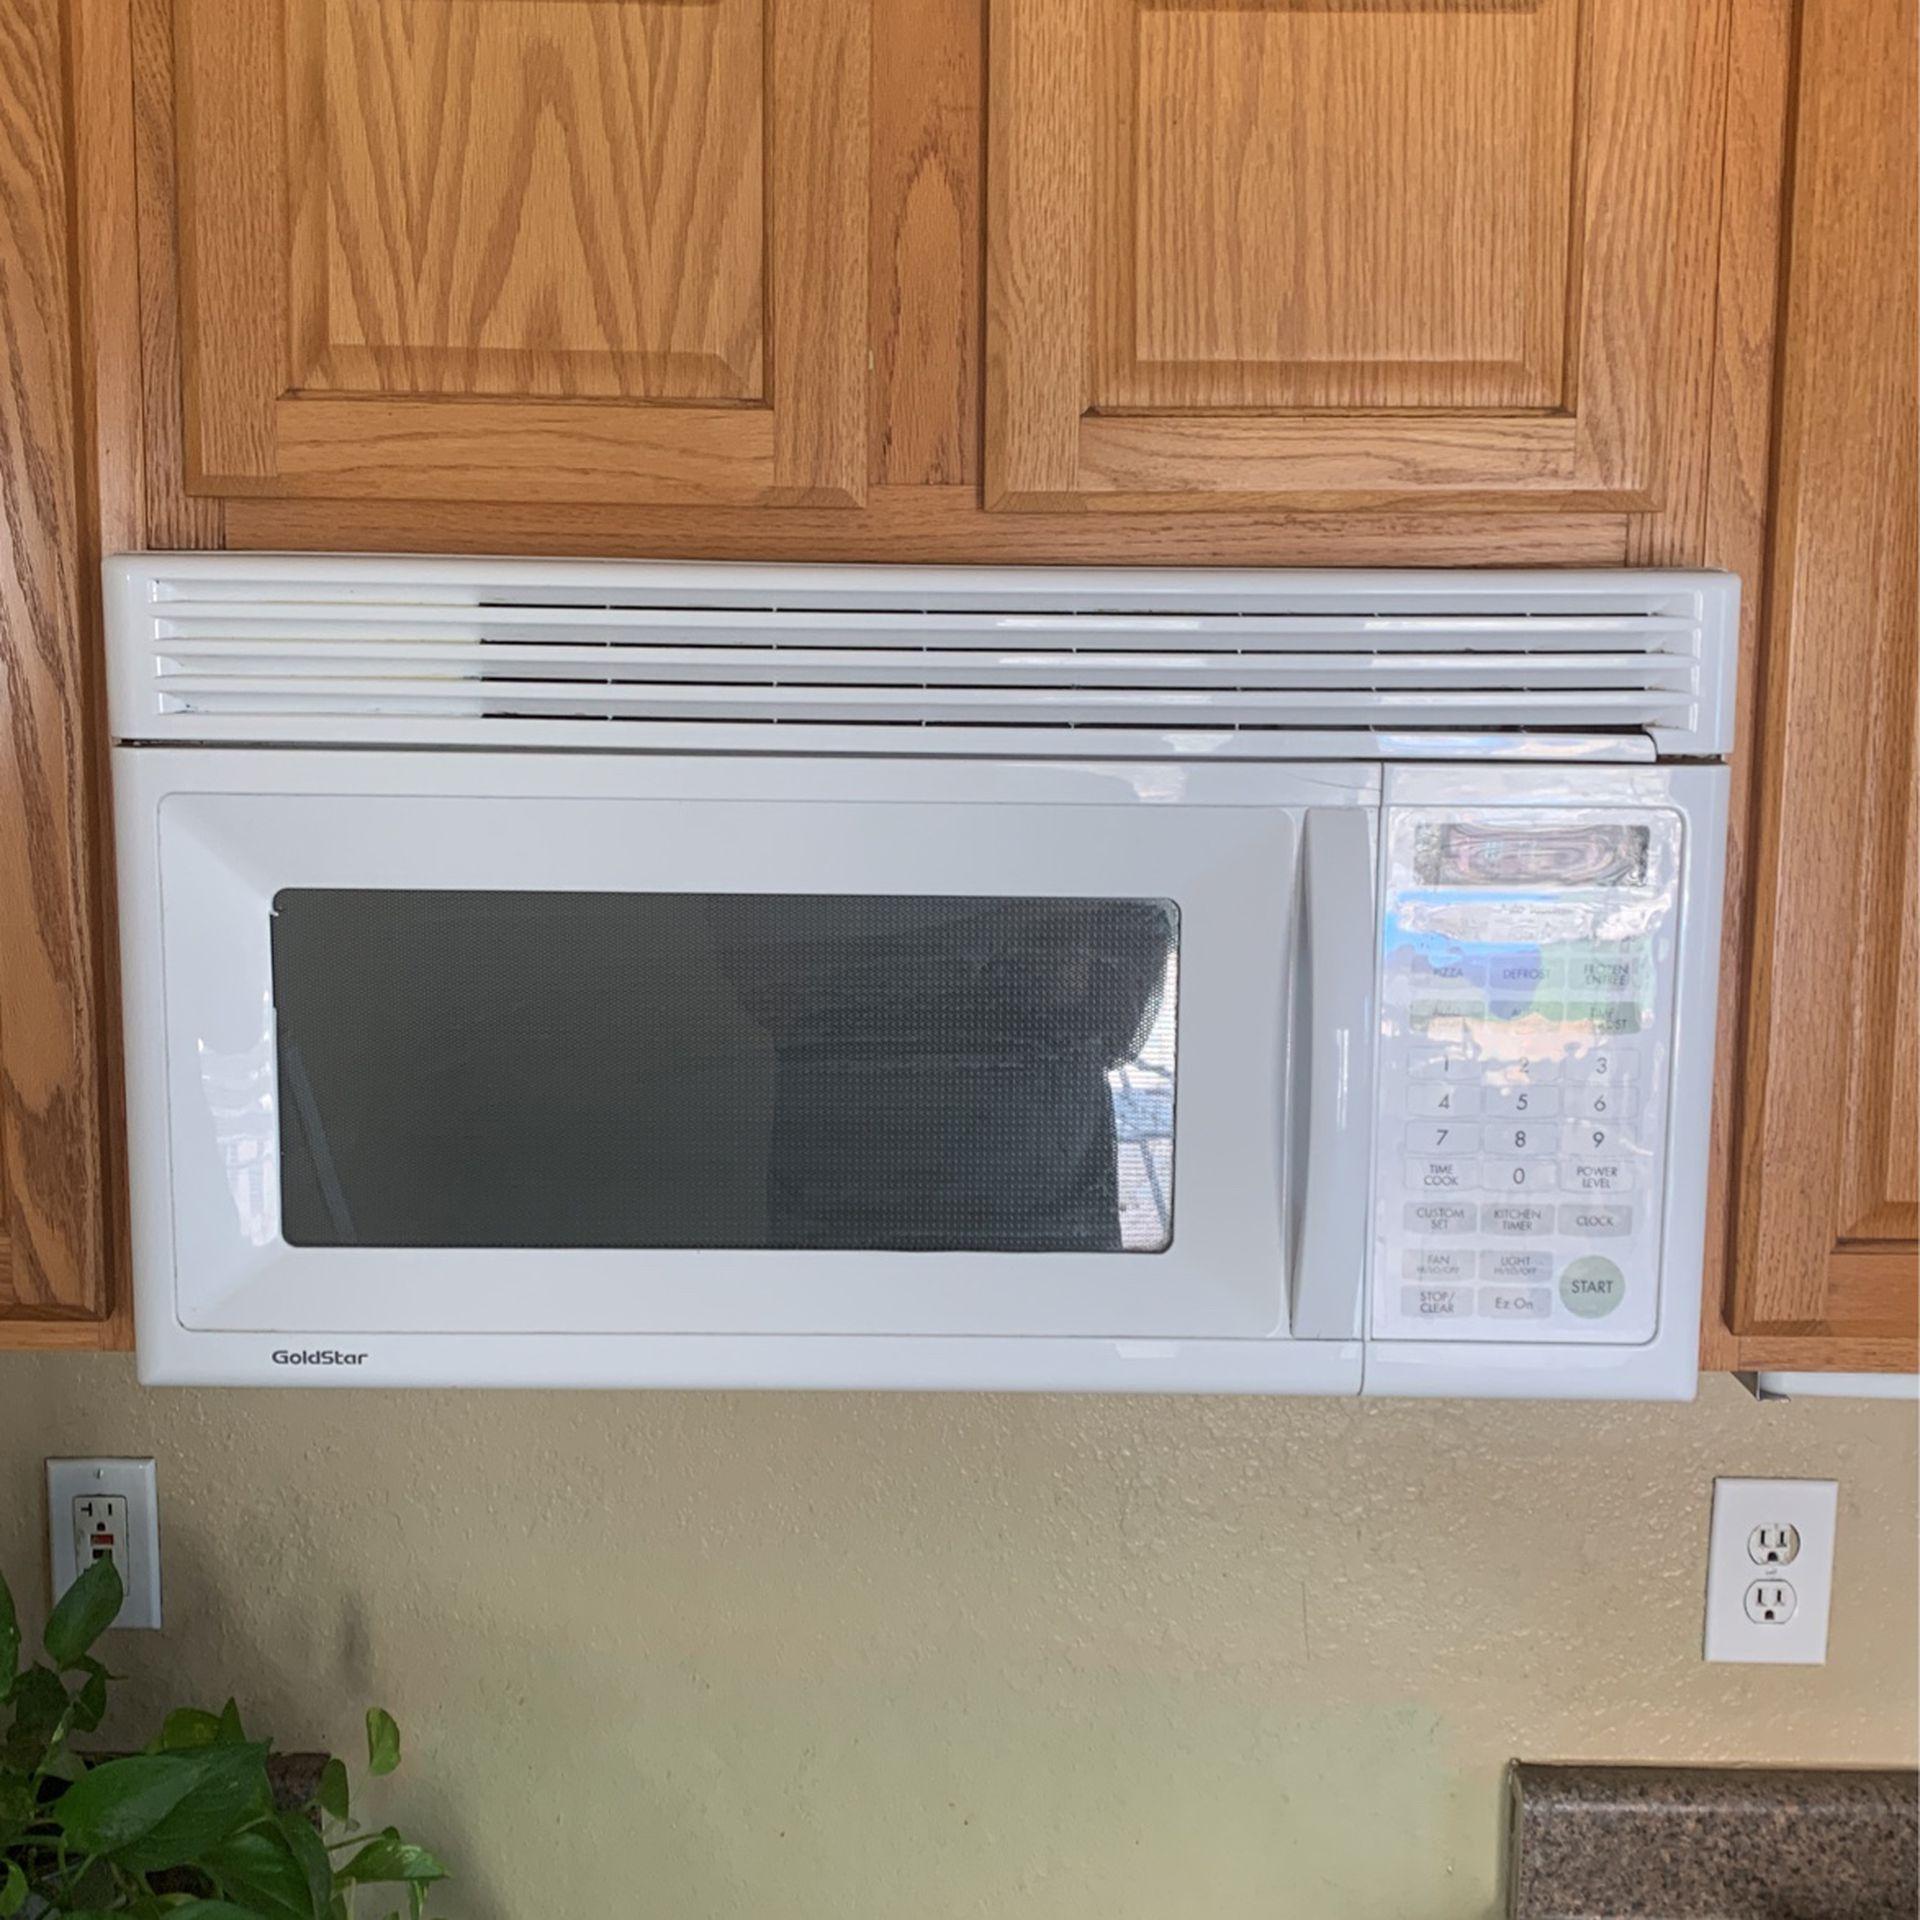 Goldstar Microwave